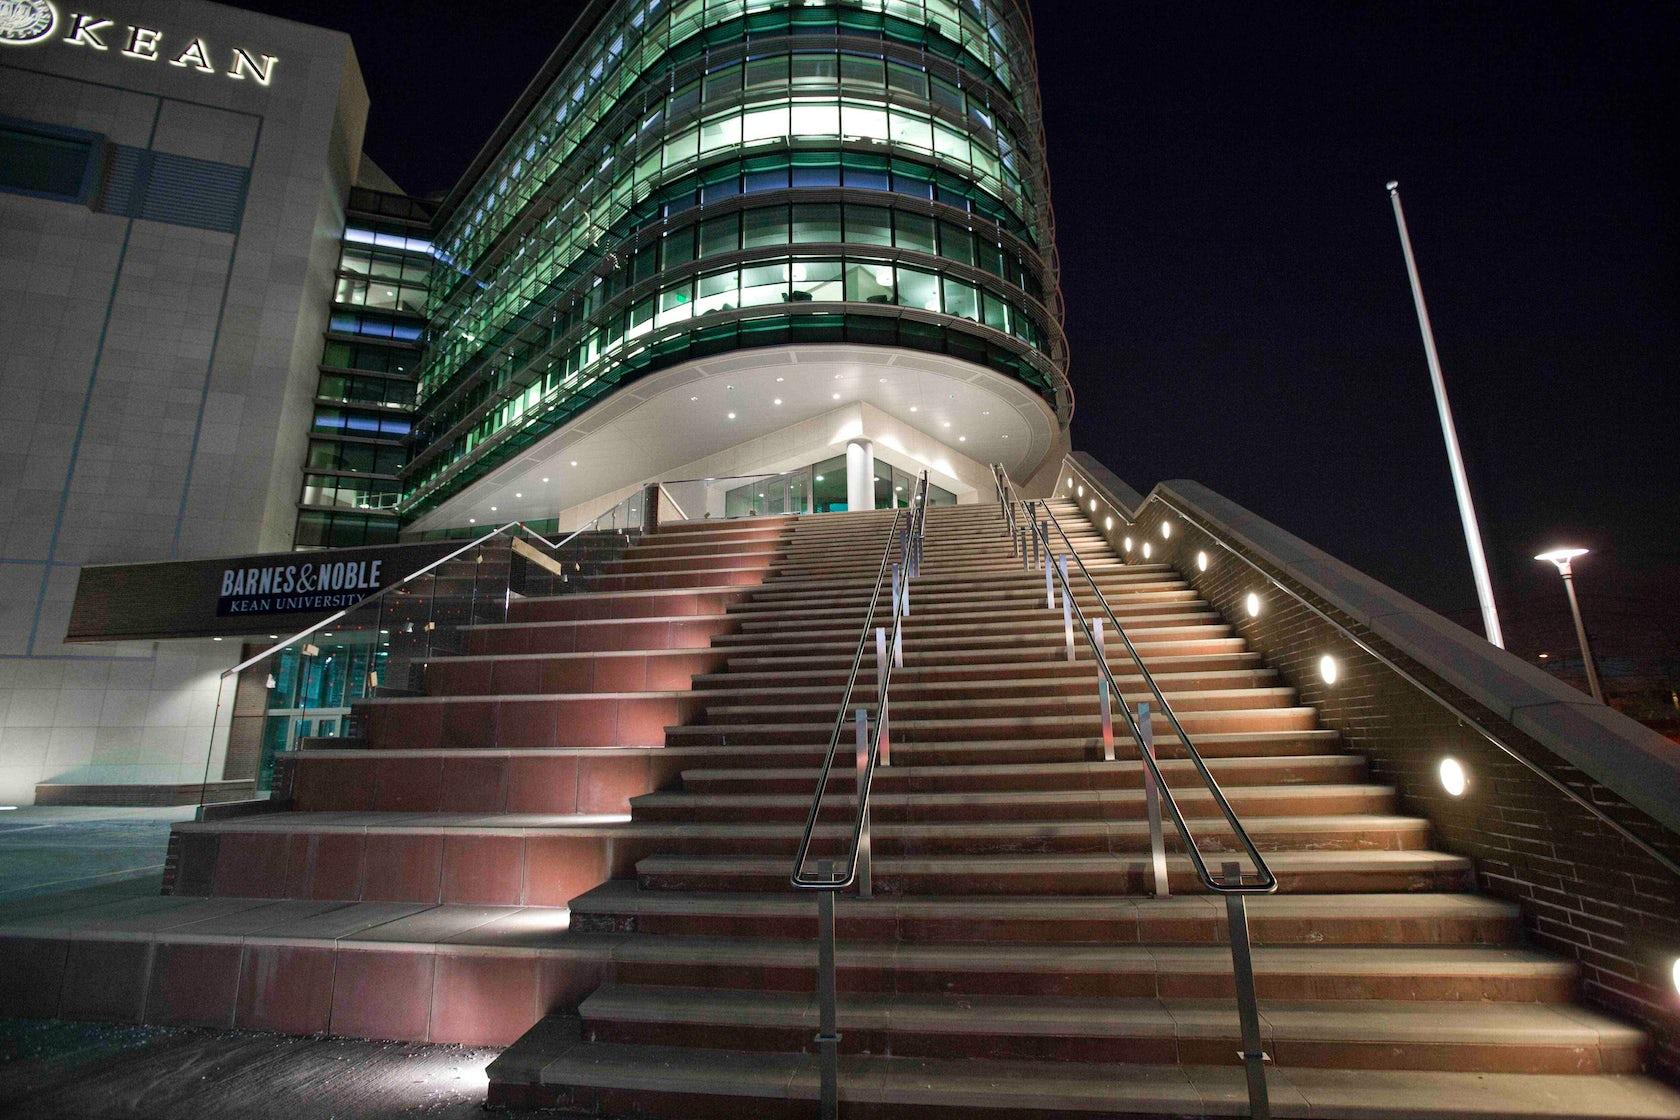 Kean University Requirements >> Kean University Green Lane Building On Architizer